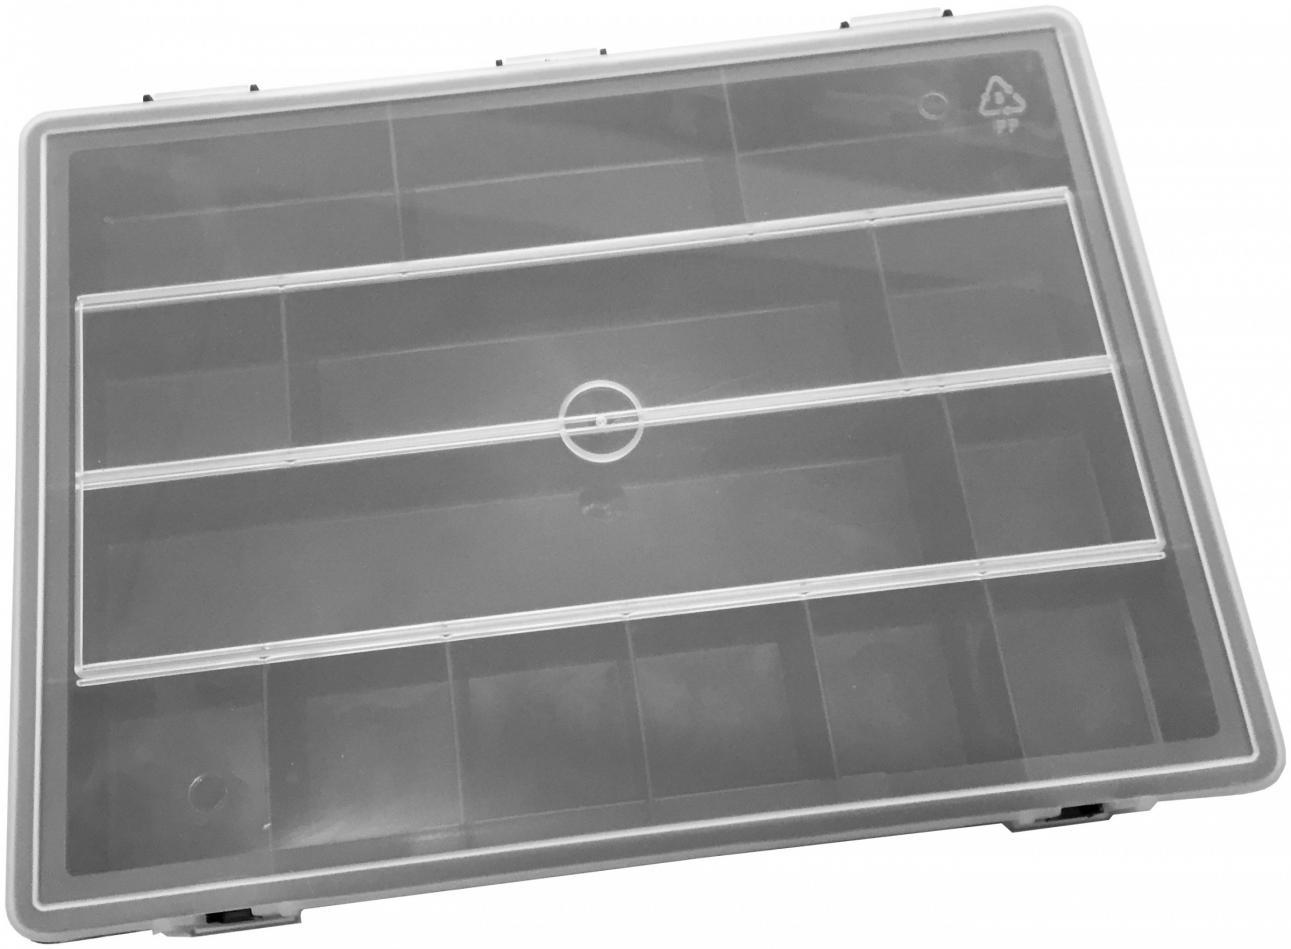 compartment box - Feldherr Full Size form factor